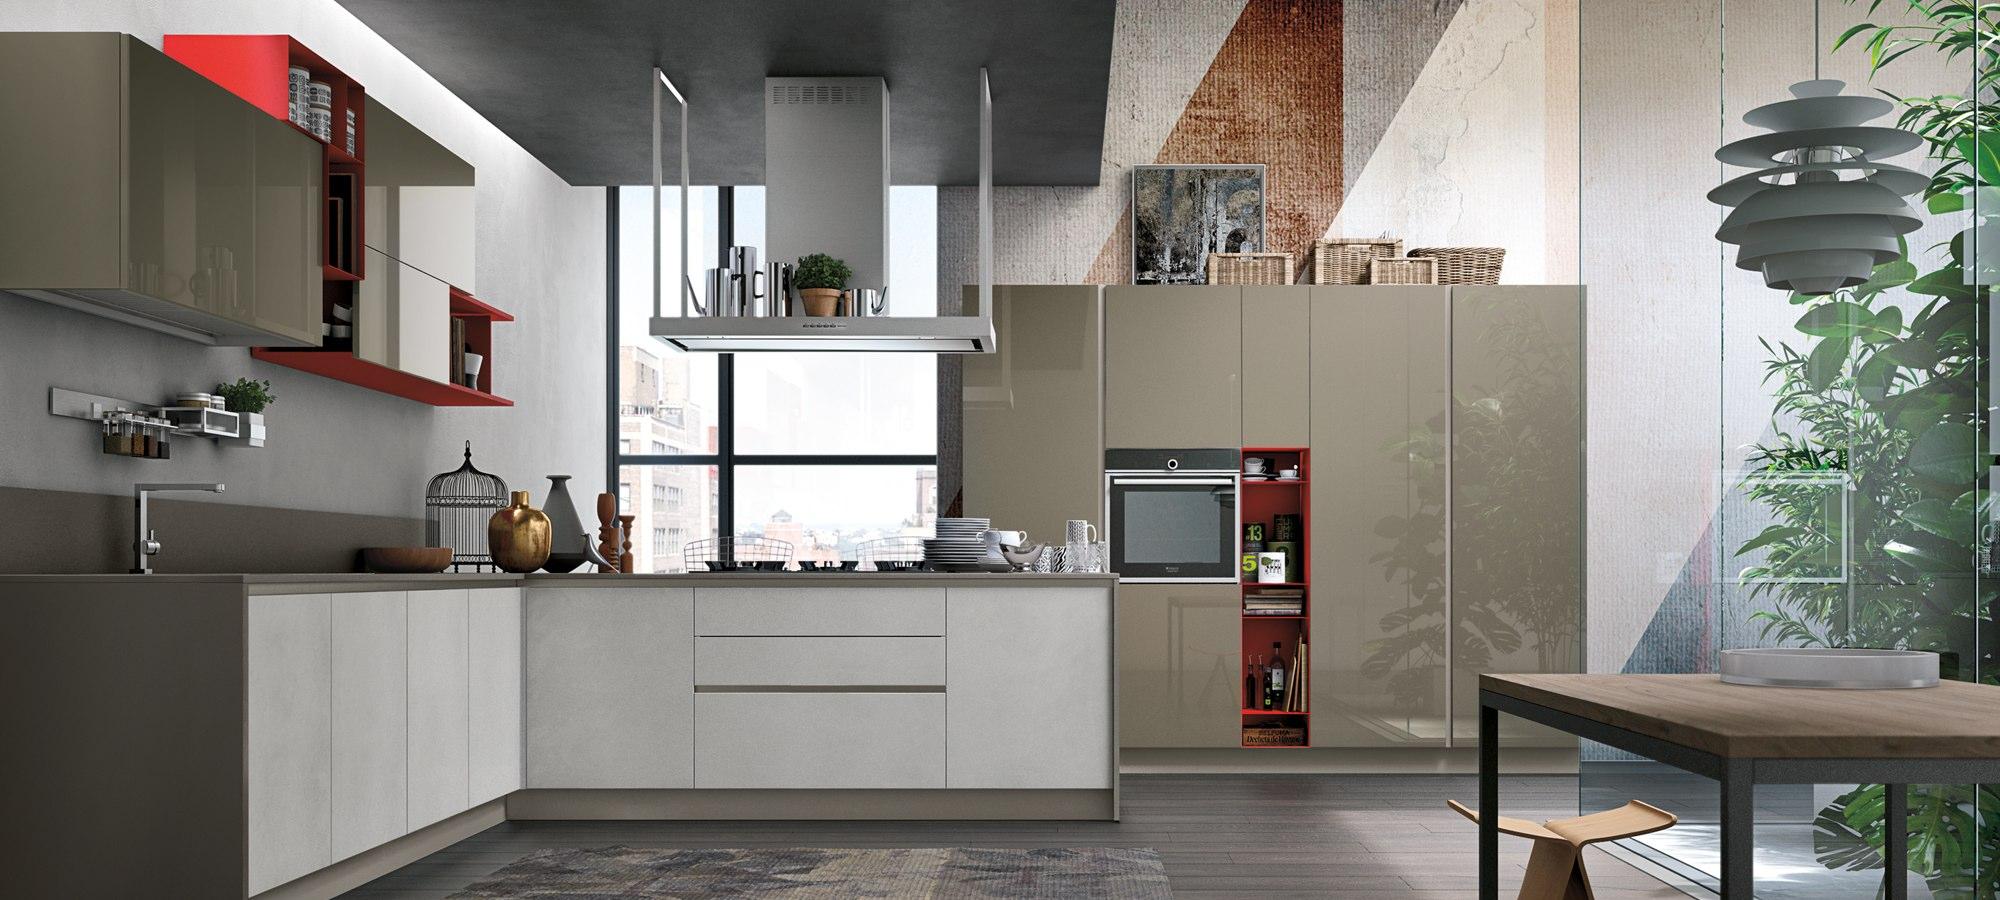 stosa-cucine-moderne-aliant-210 - Arredo e Oltre Geraci Siculo